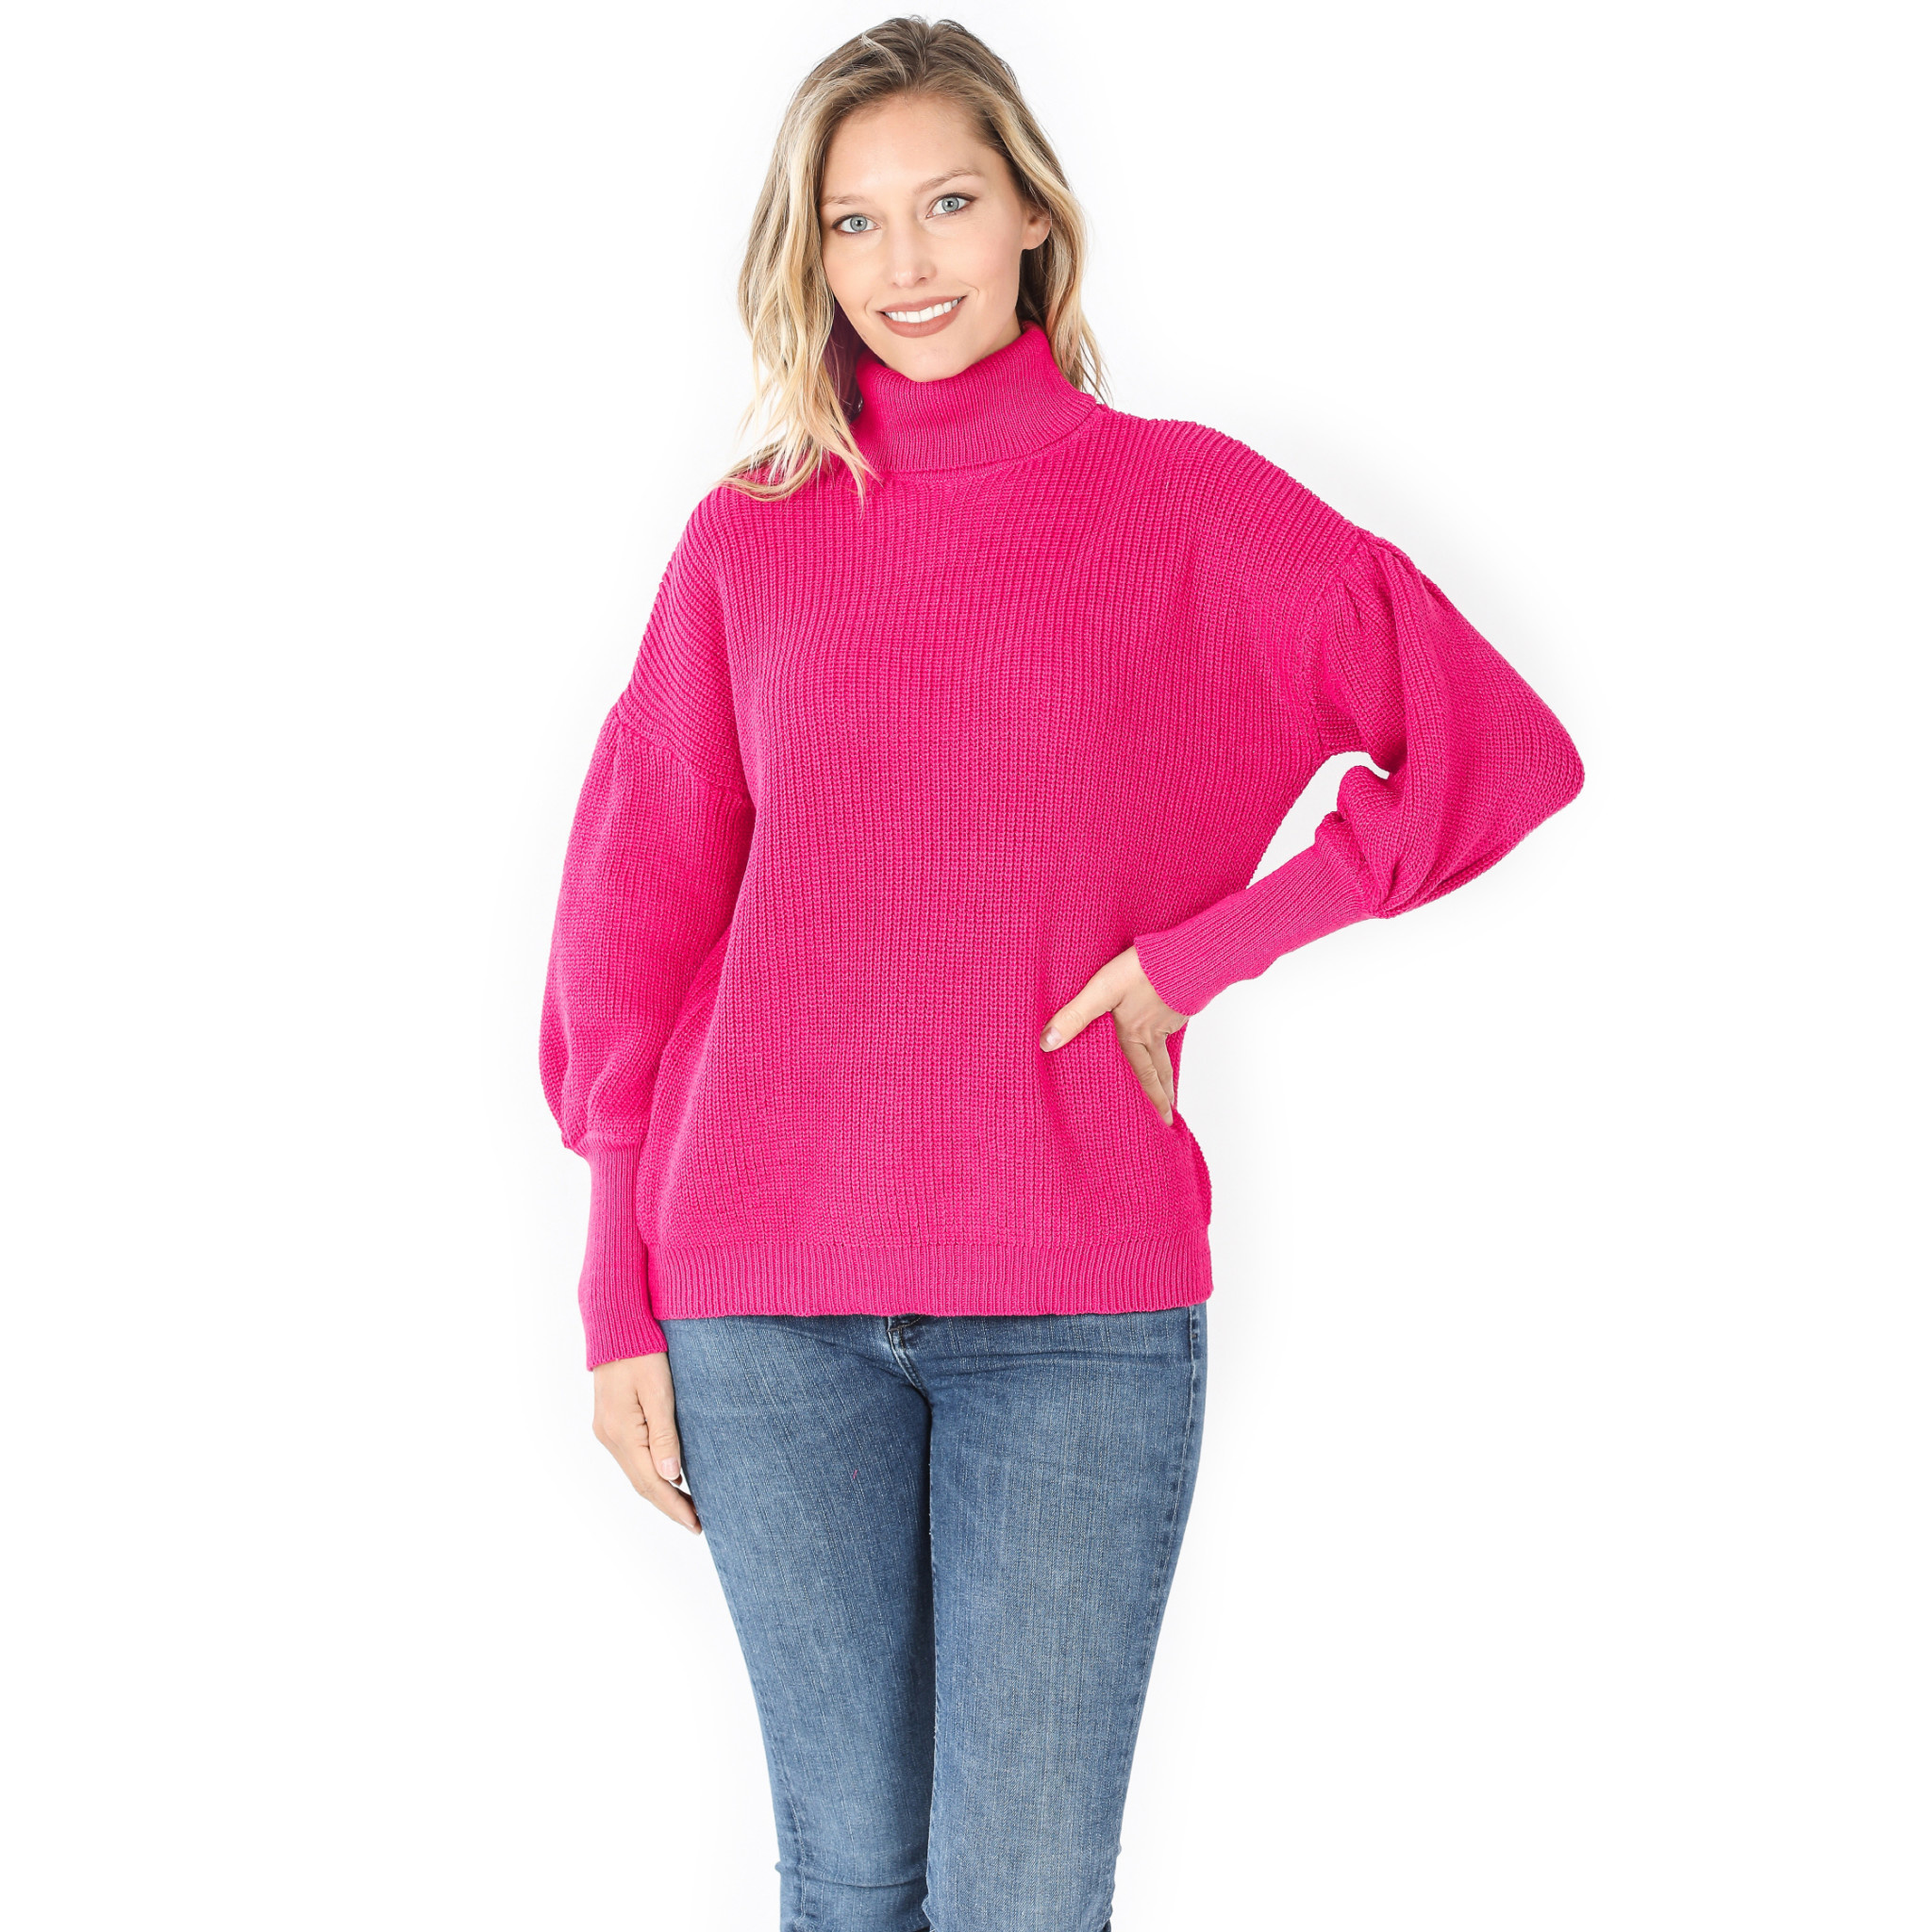 Fleurish Home Puff Sleeve Turtleneck Sweater *last chance